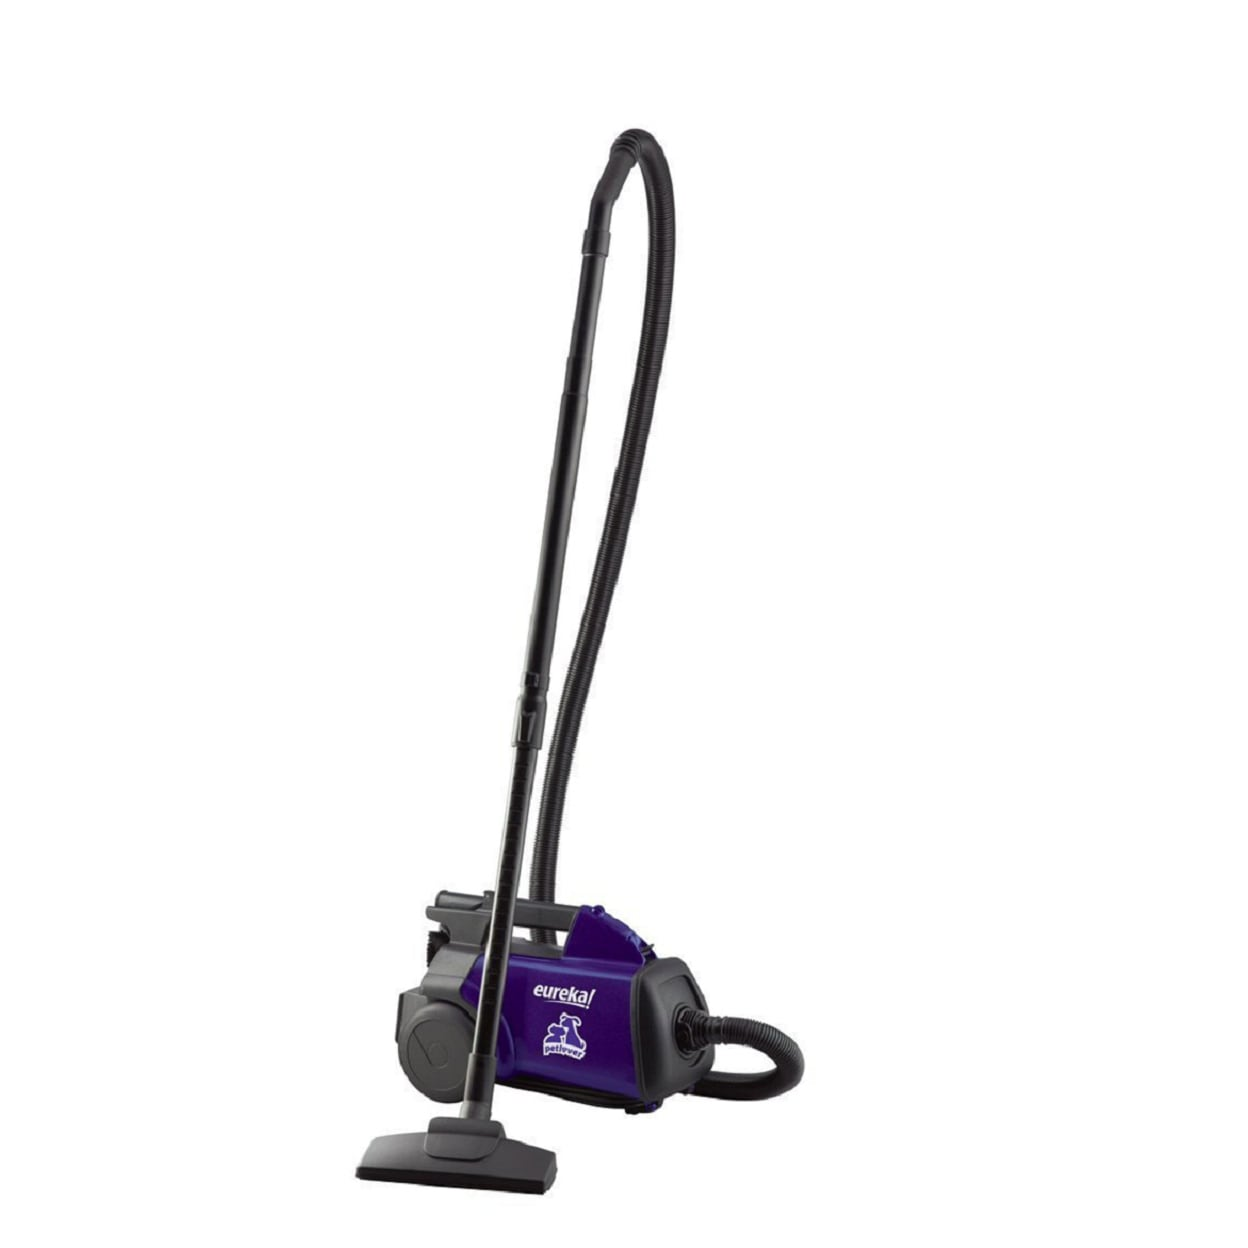 Eureka 3684F Pet Lover Mighty Mite Vacuum Cleaner, Black